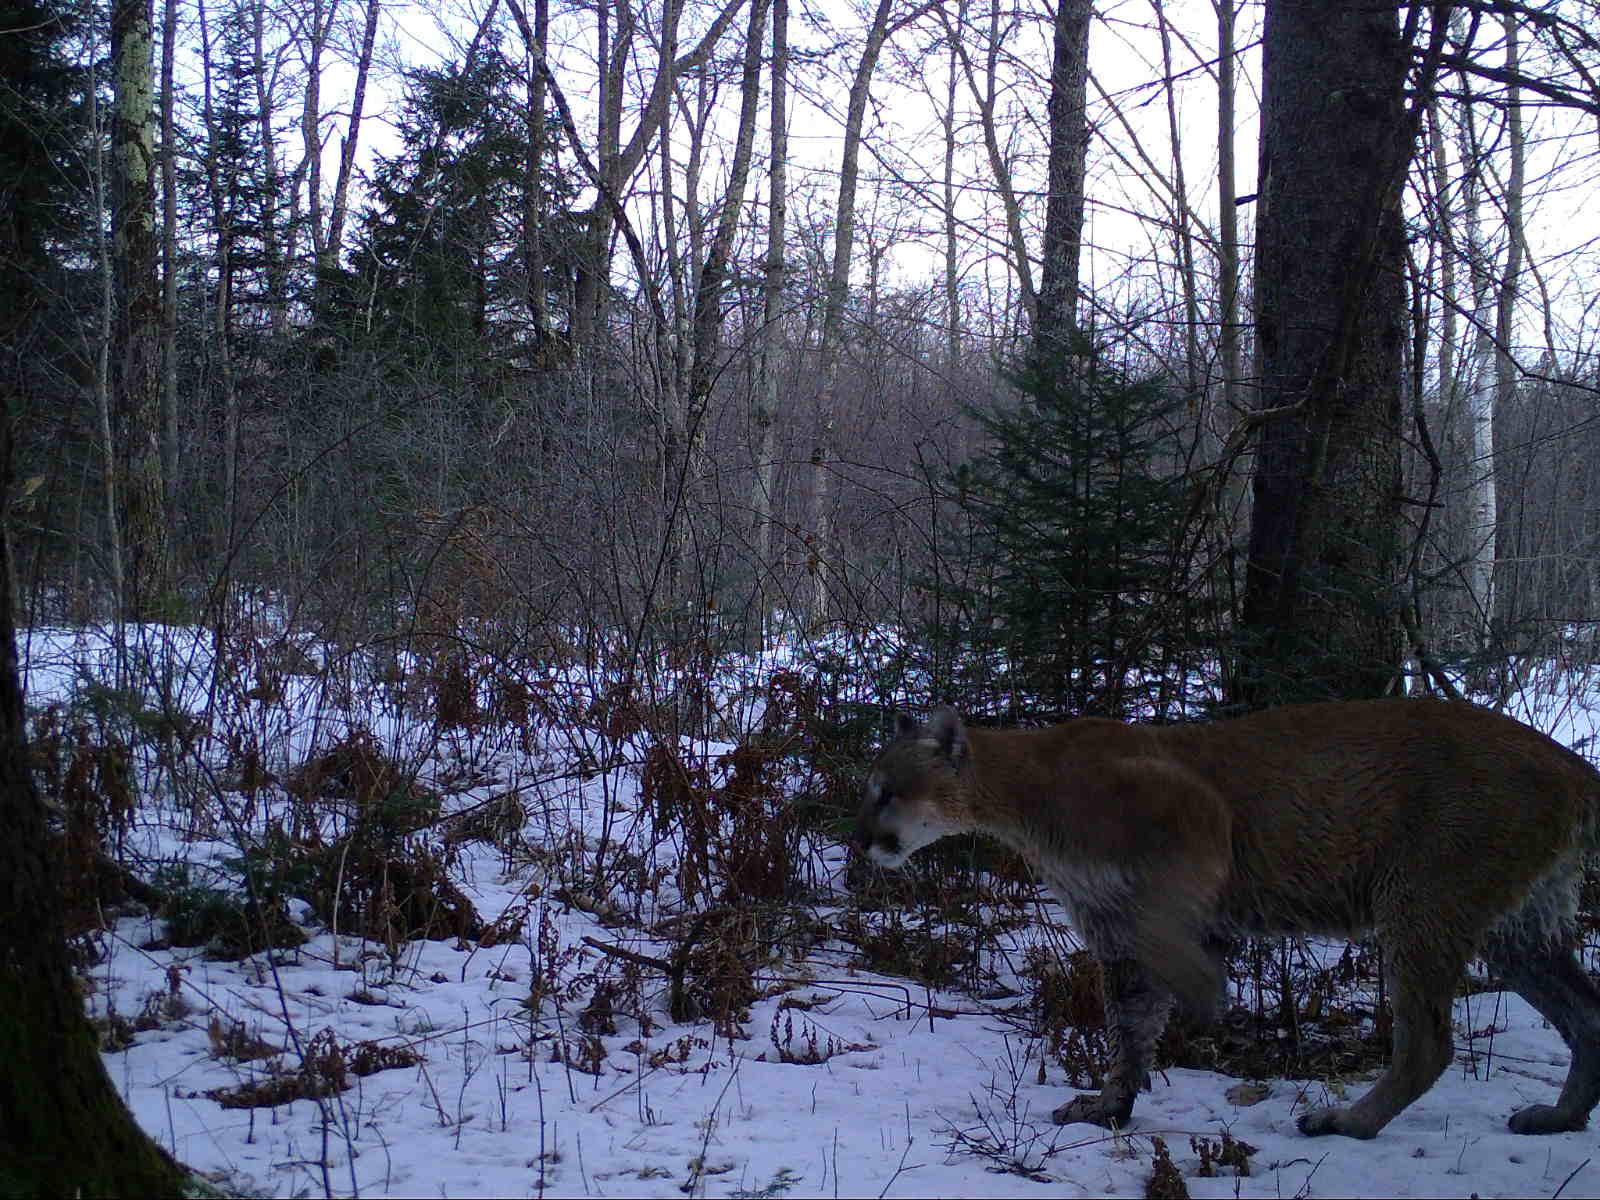 A cougar